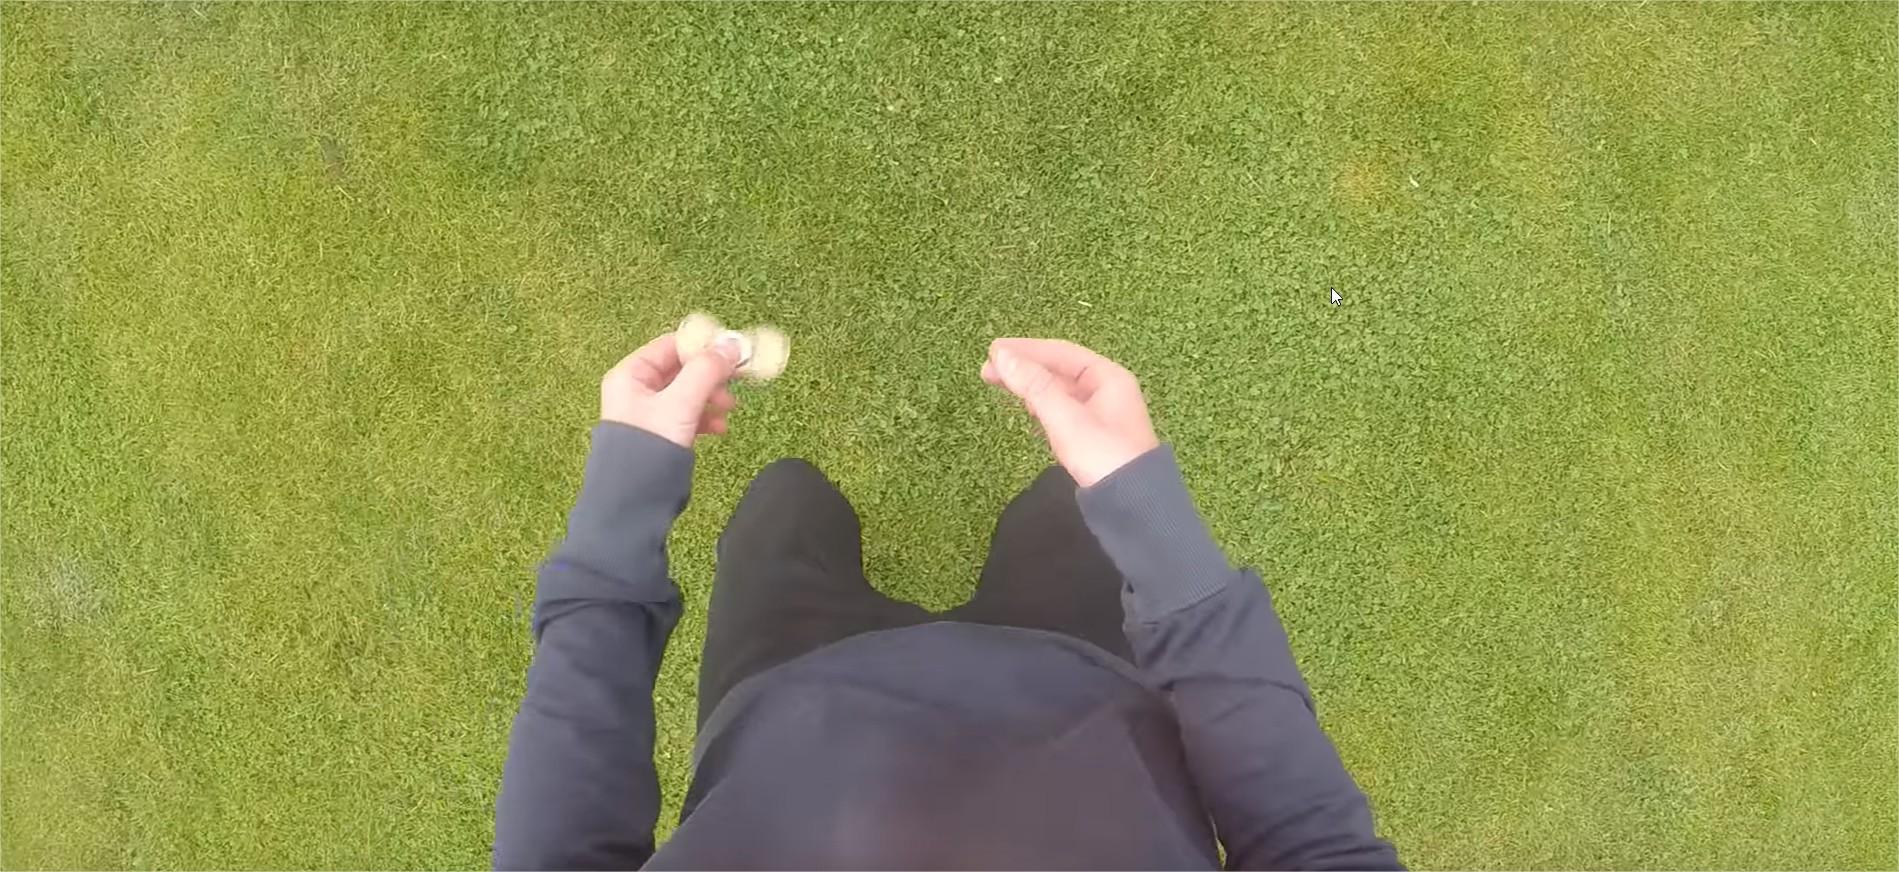 Seje tricks med fidget spinners